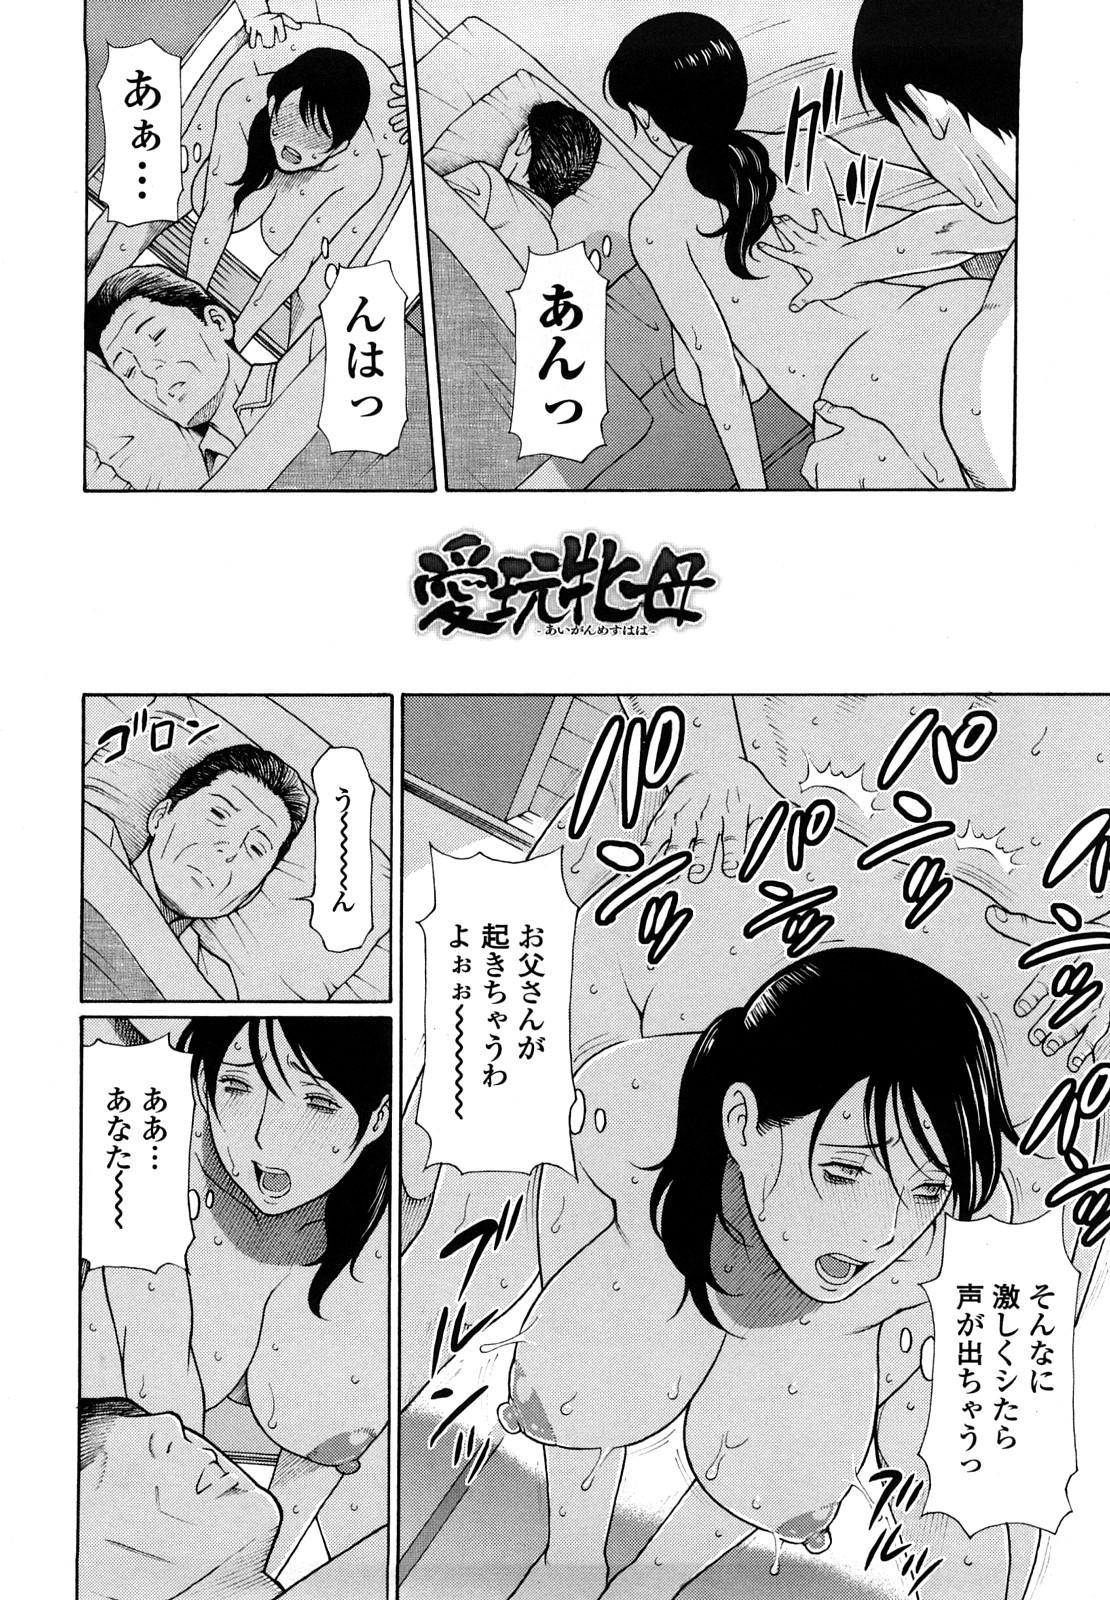 [Takasugi Kou] Kindan no Haha-Ana - Immorality Love-Hole [Decensored] 77